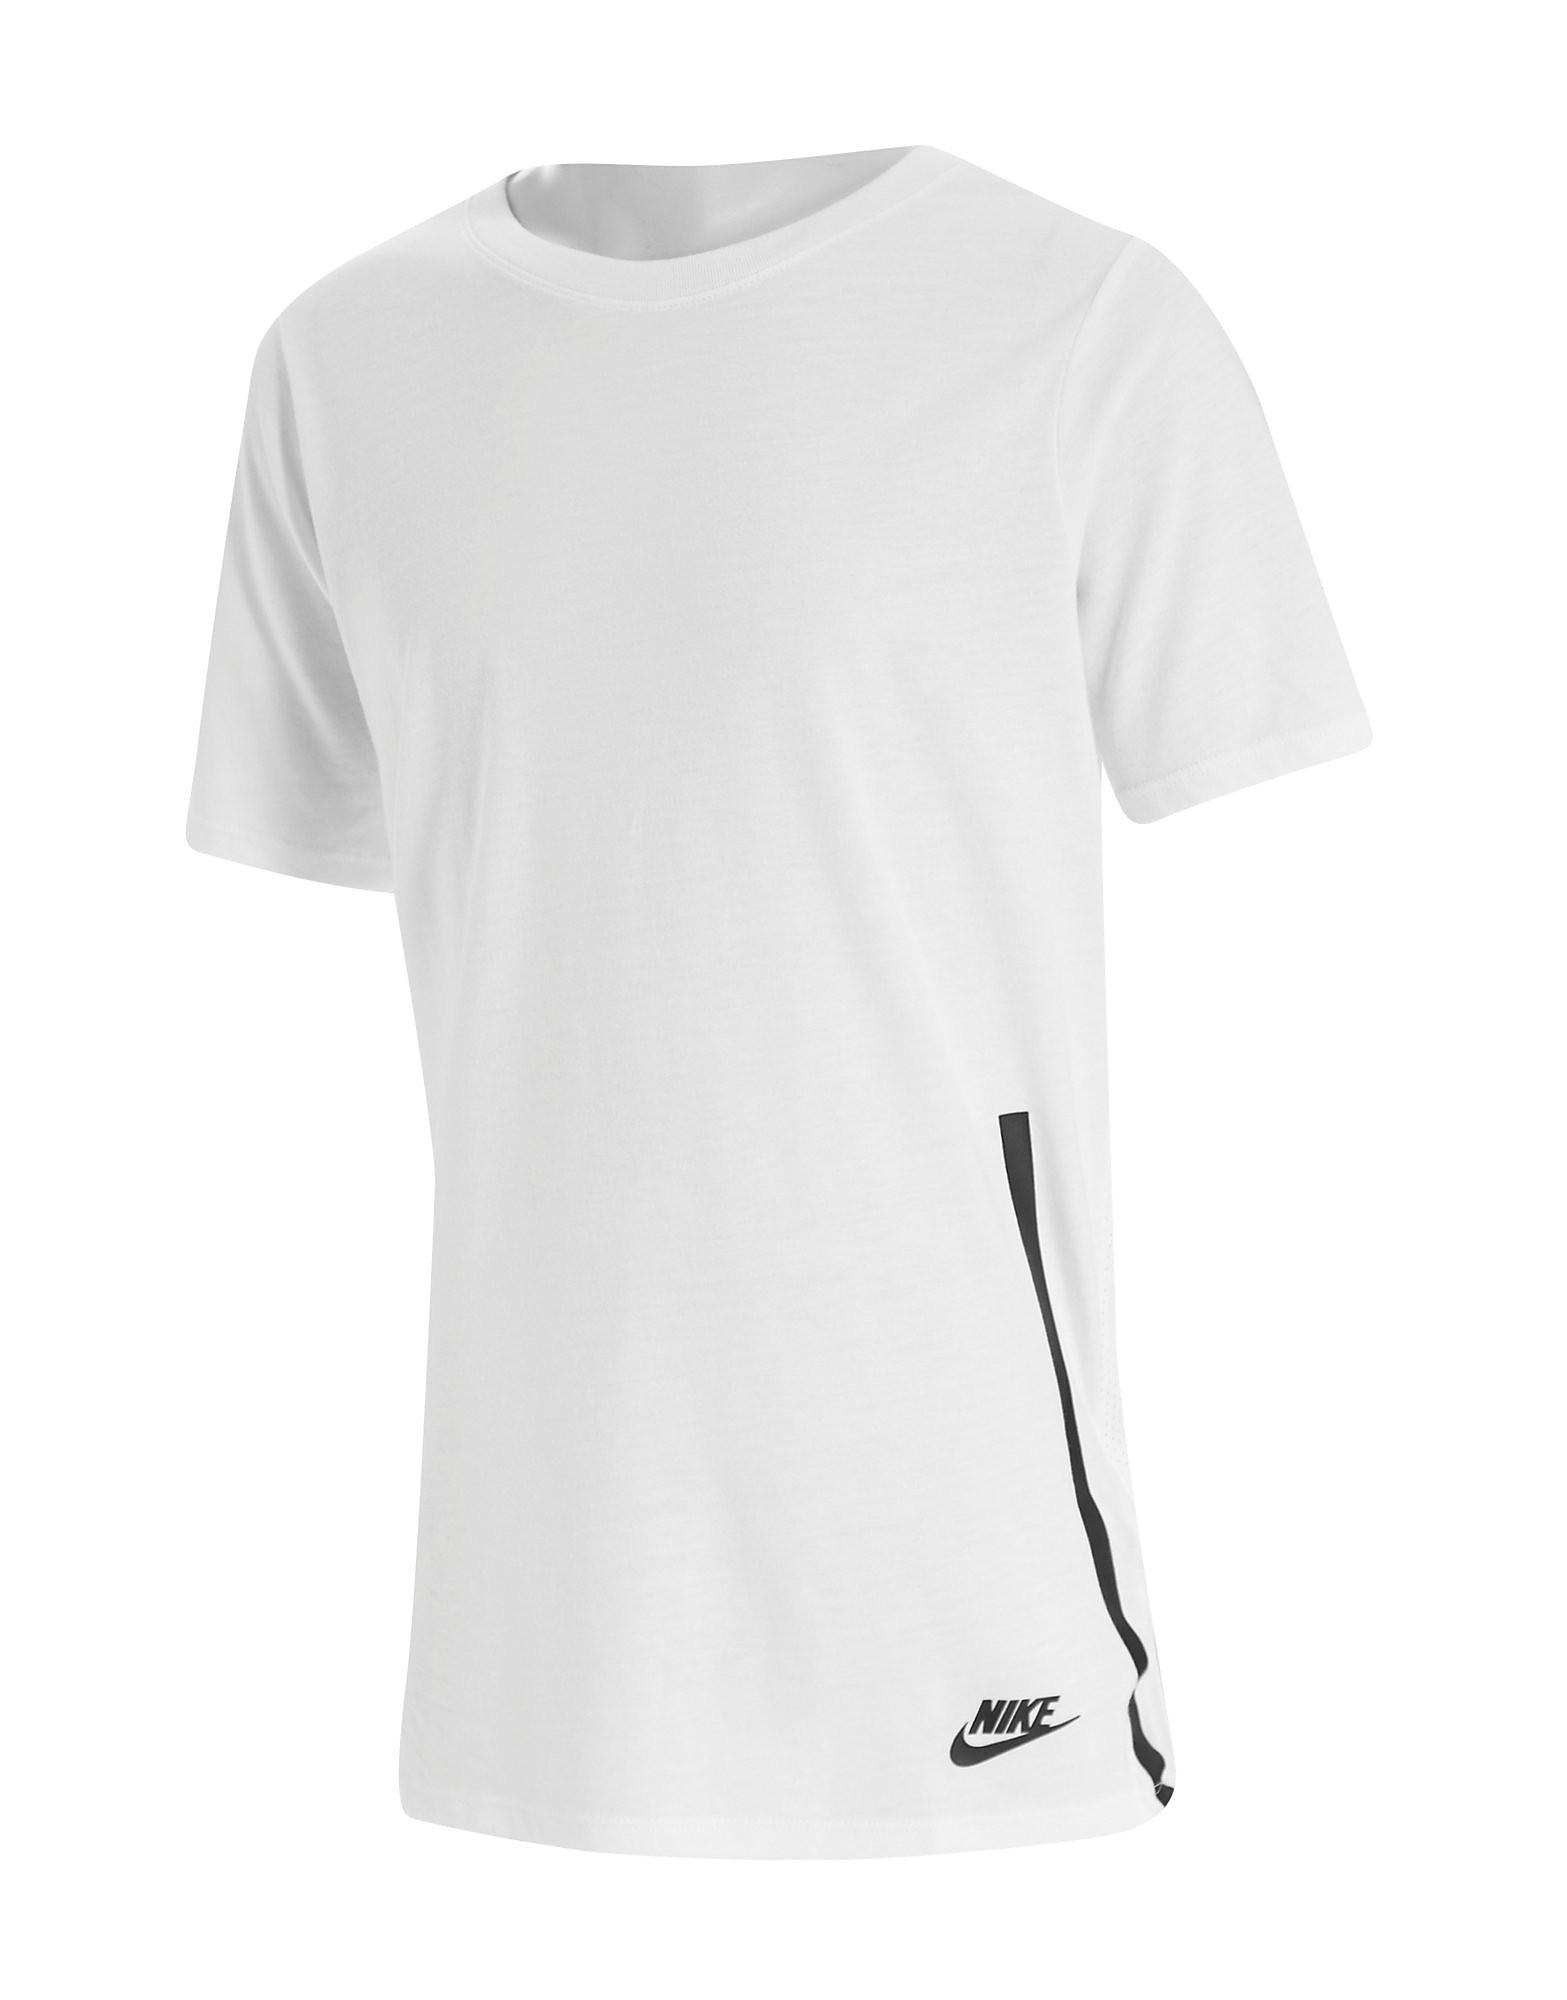 Nike Tri Blend Tech T-Shirt Junior